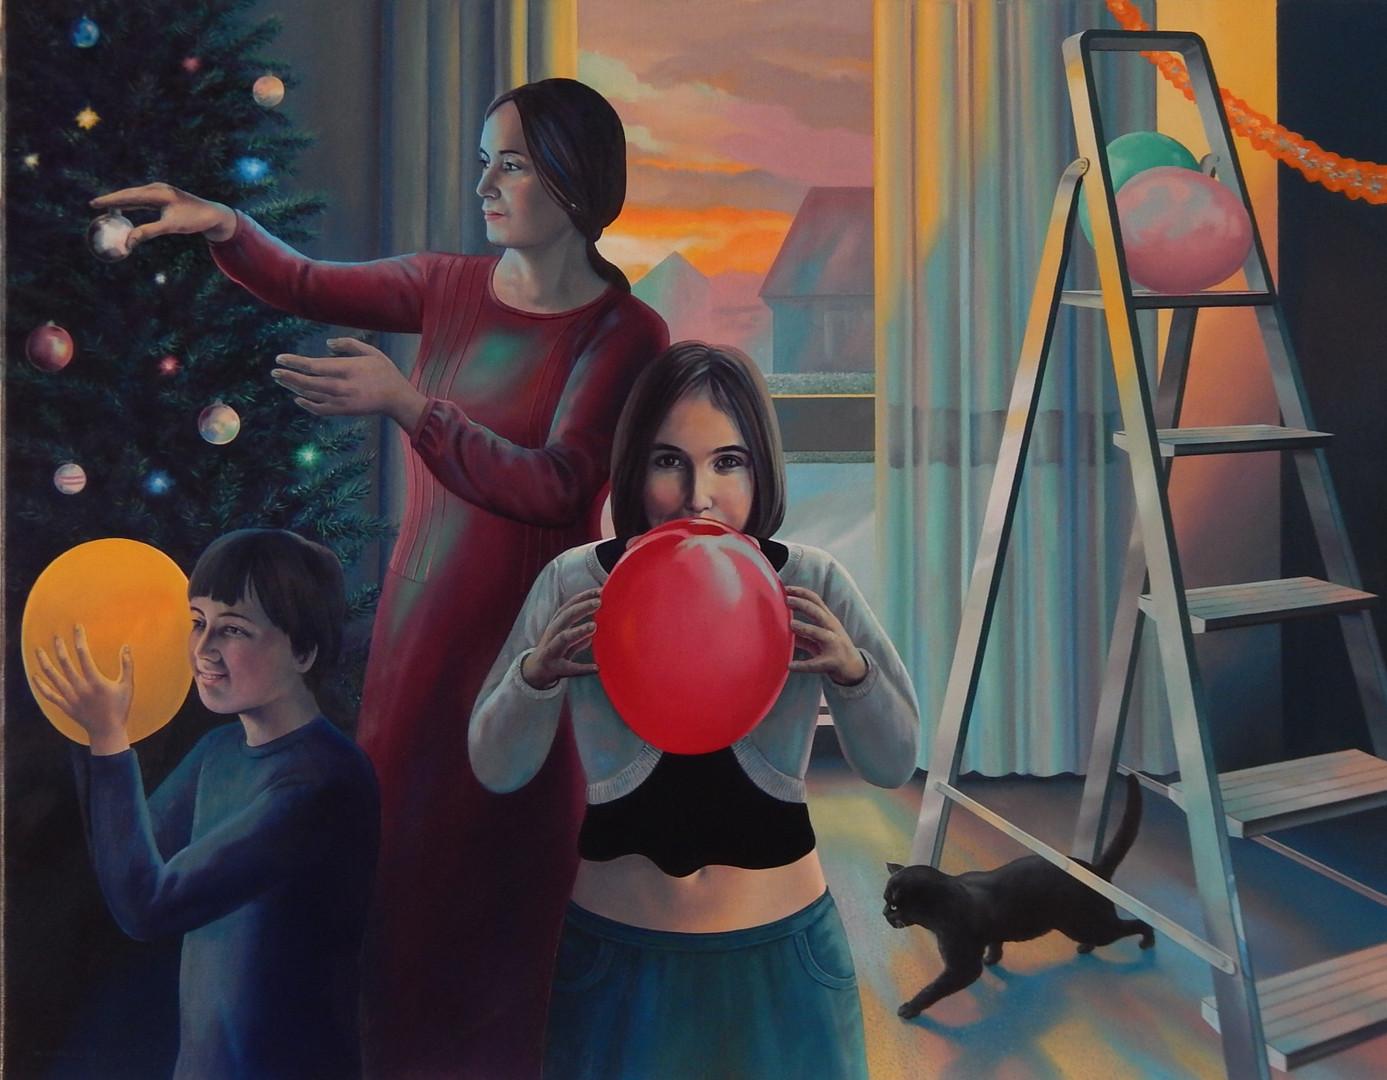 The Coming of Christmas (2020)